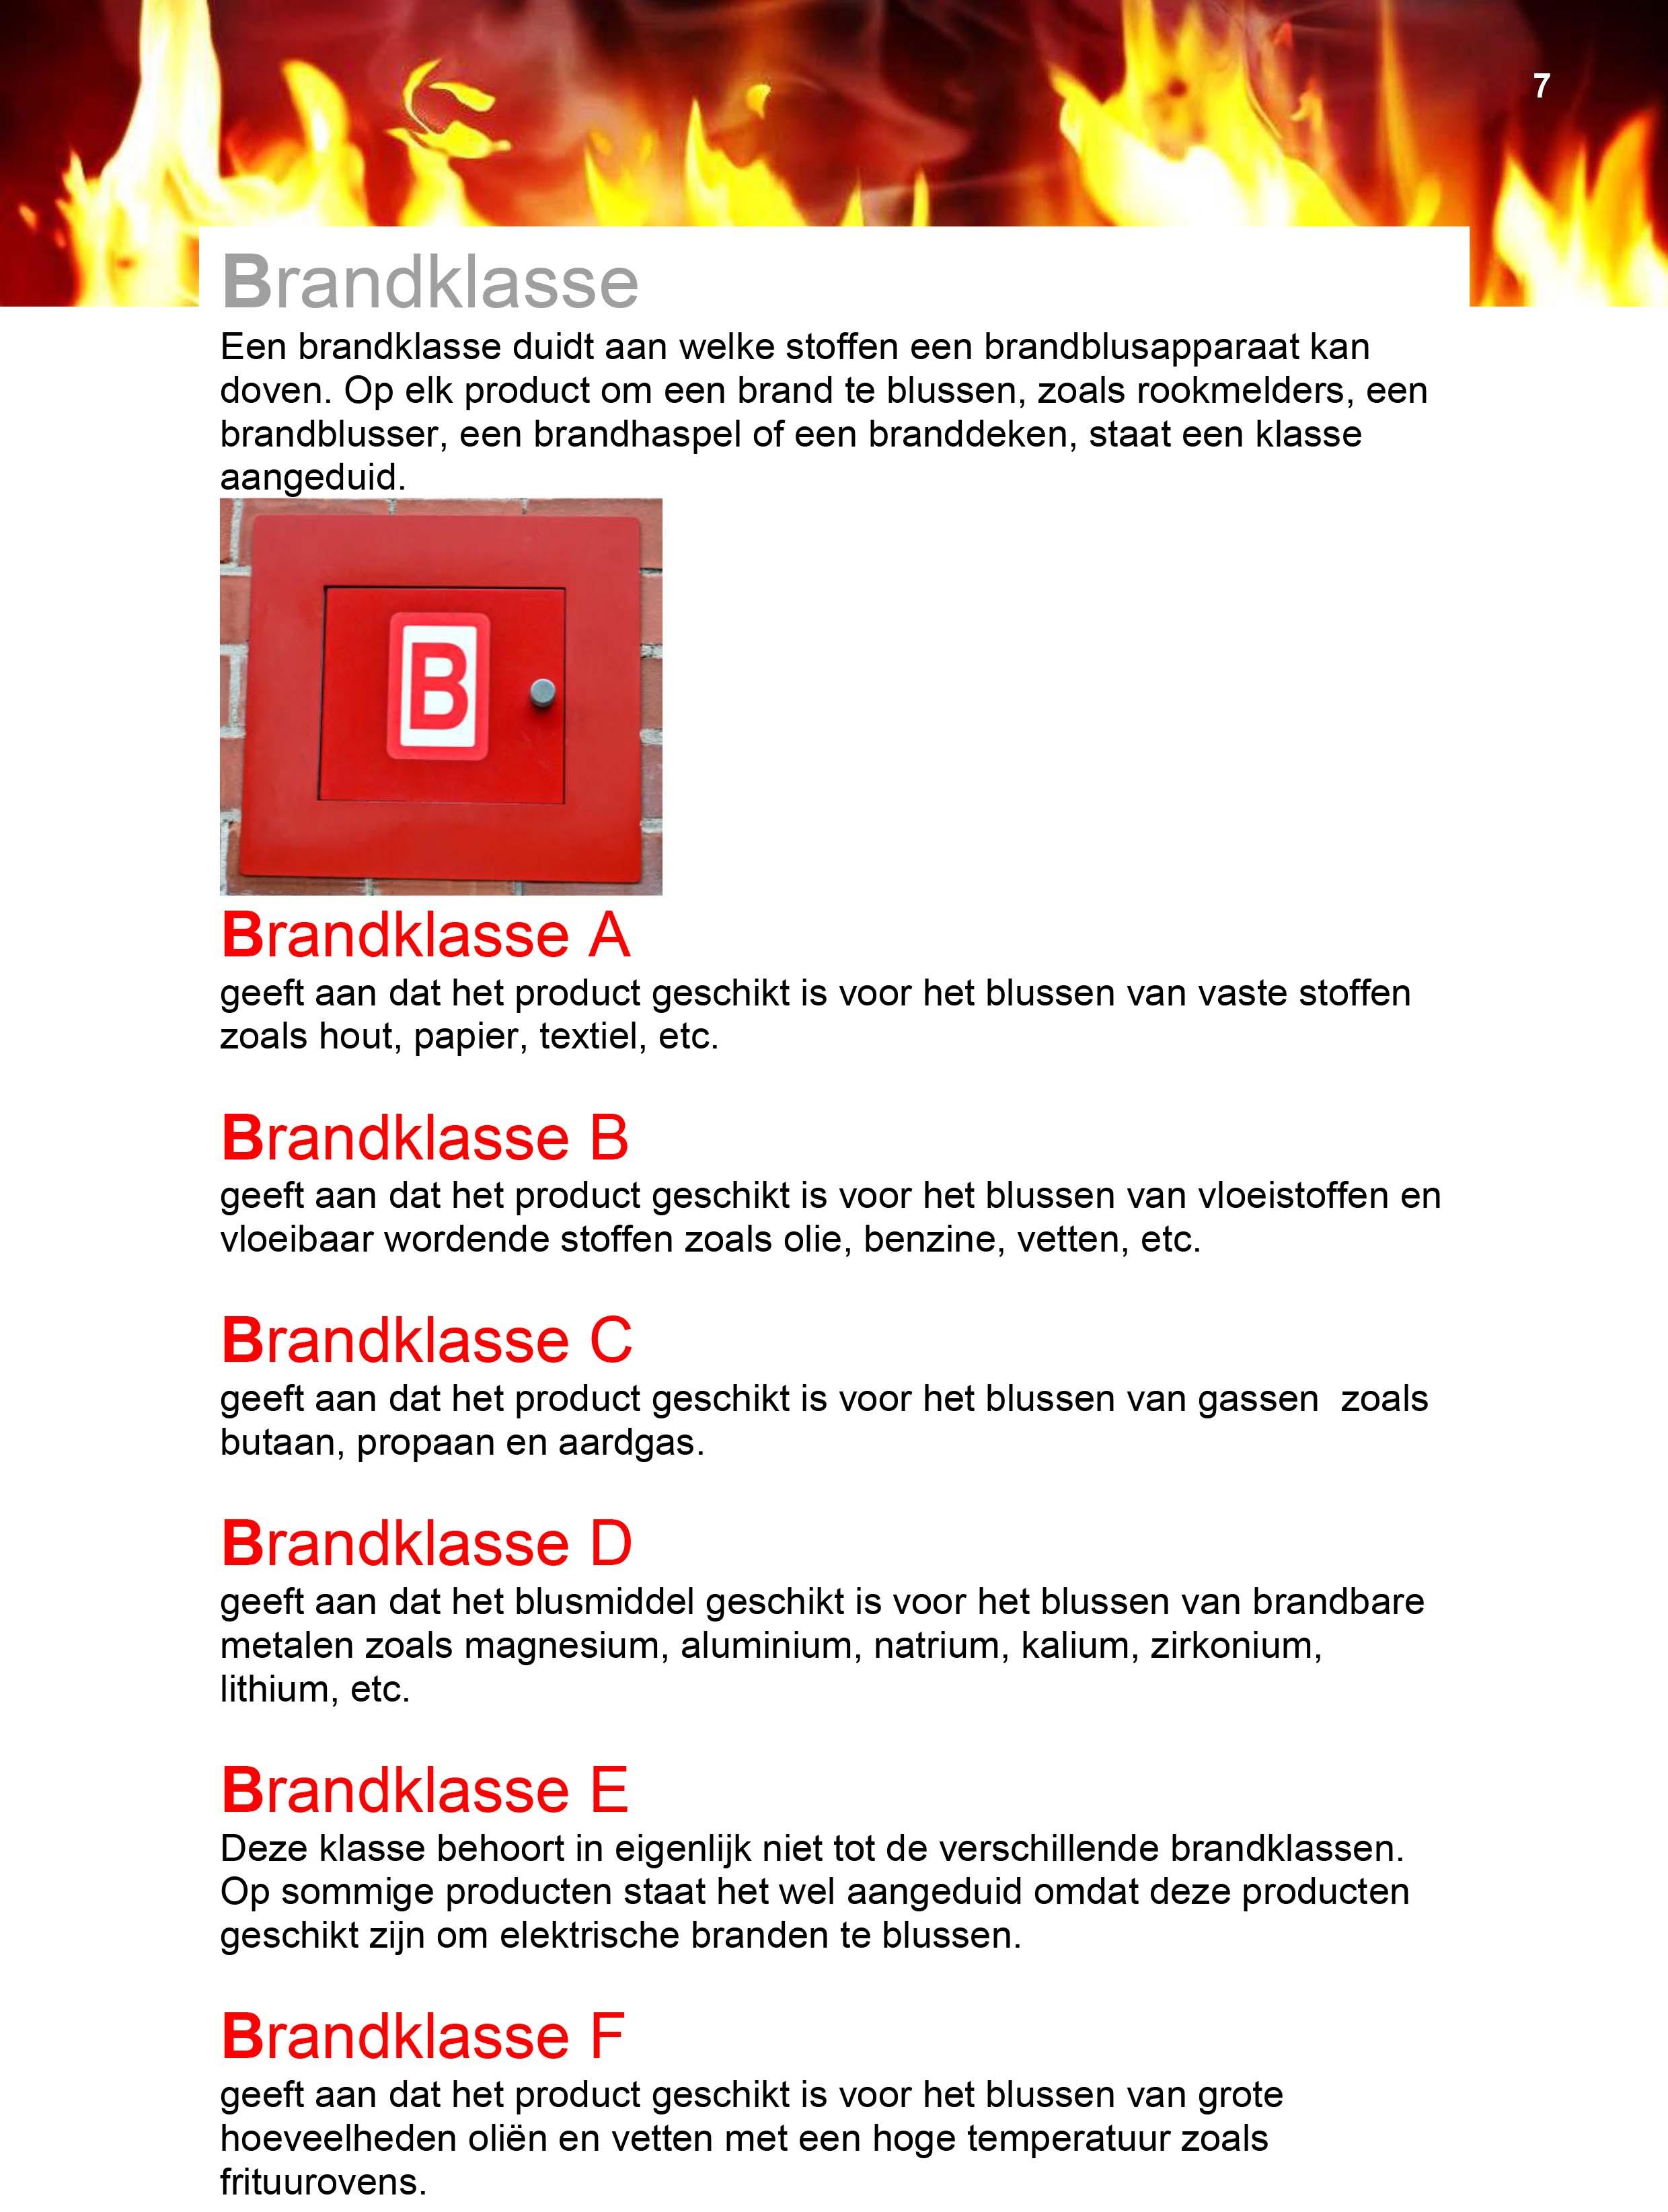 05 Brandklasse